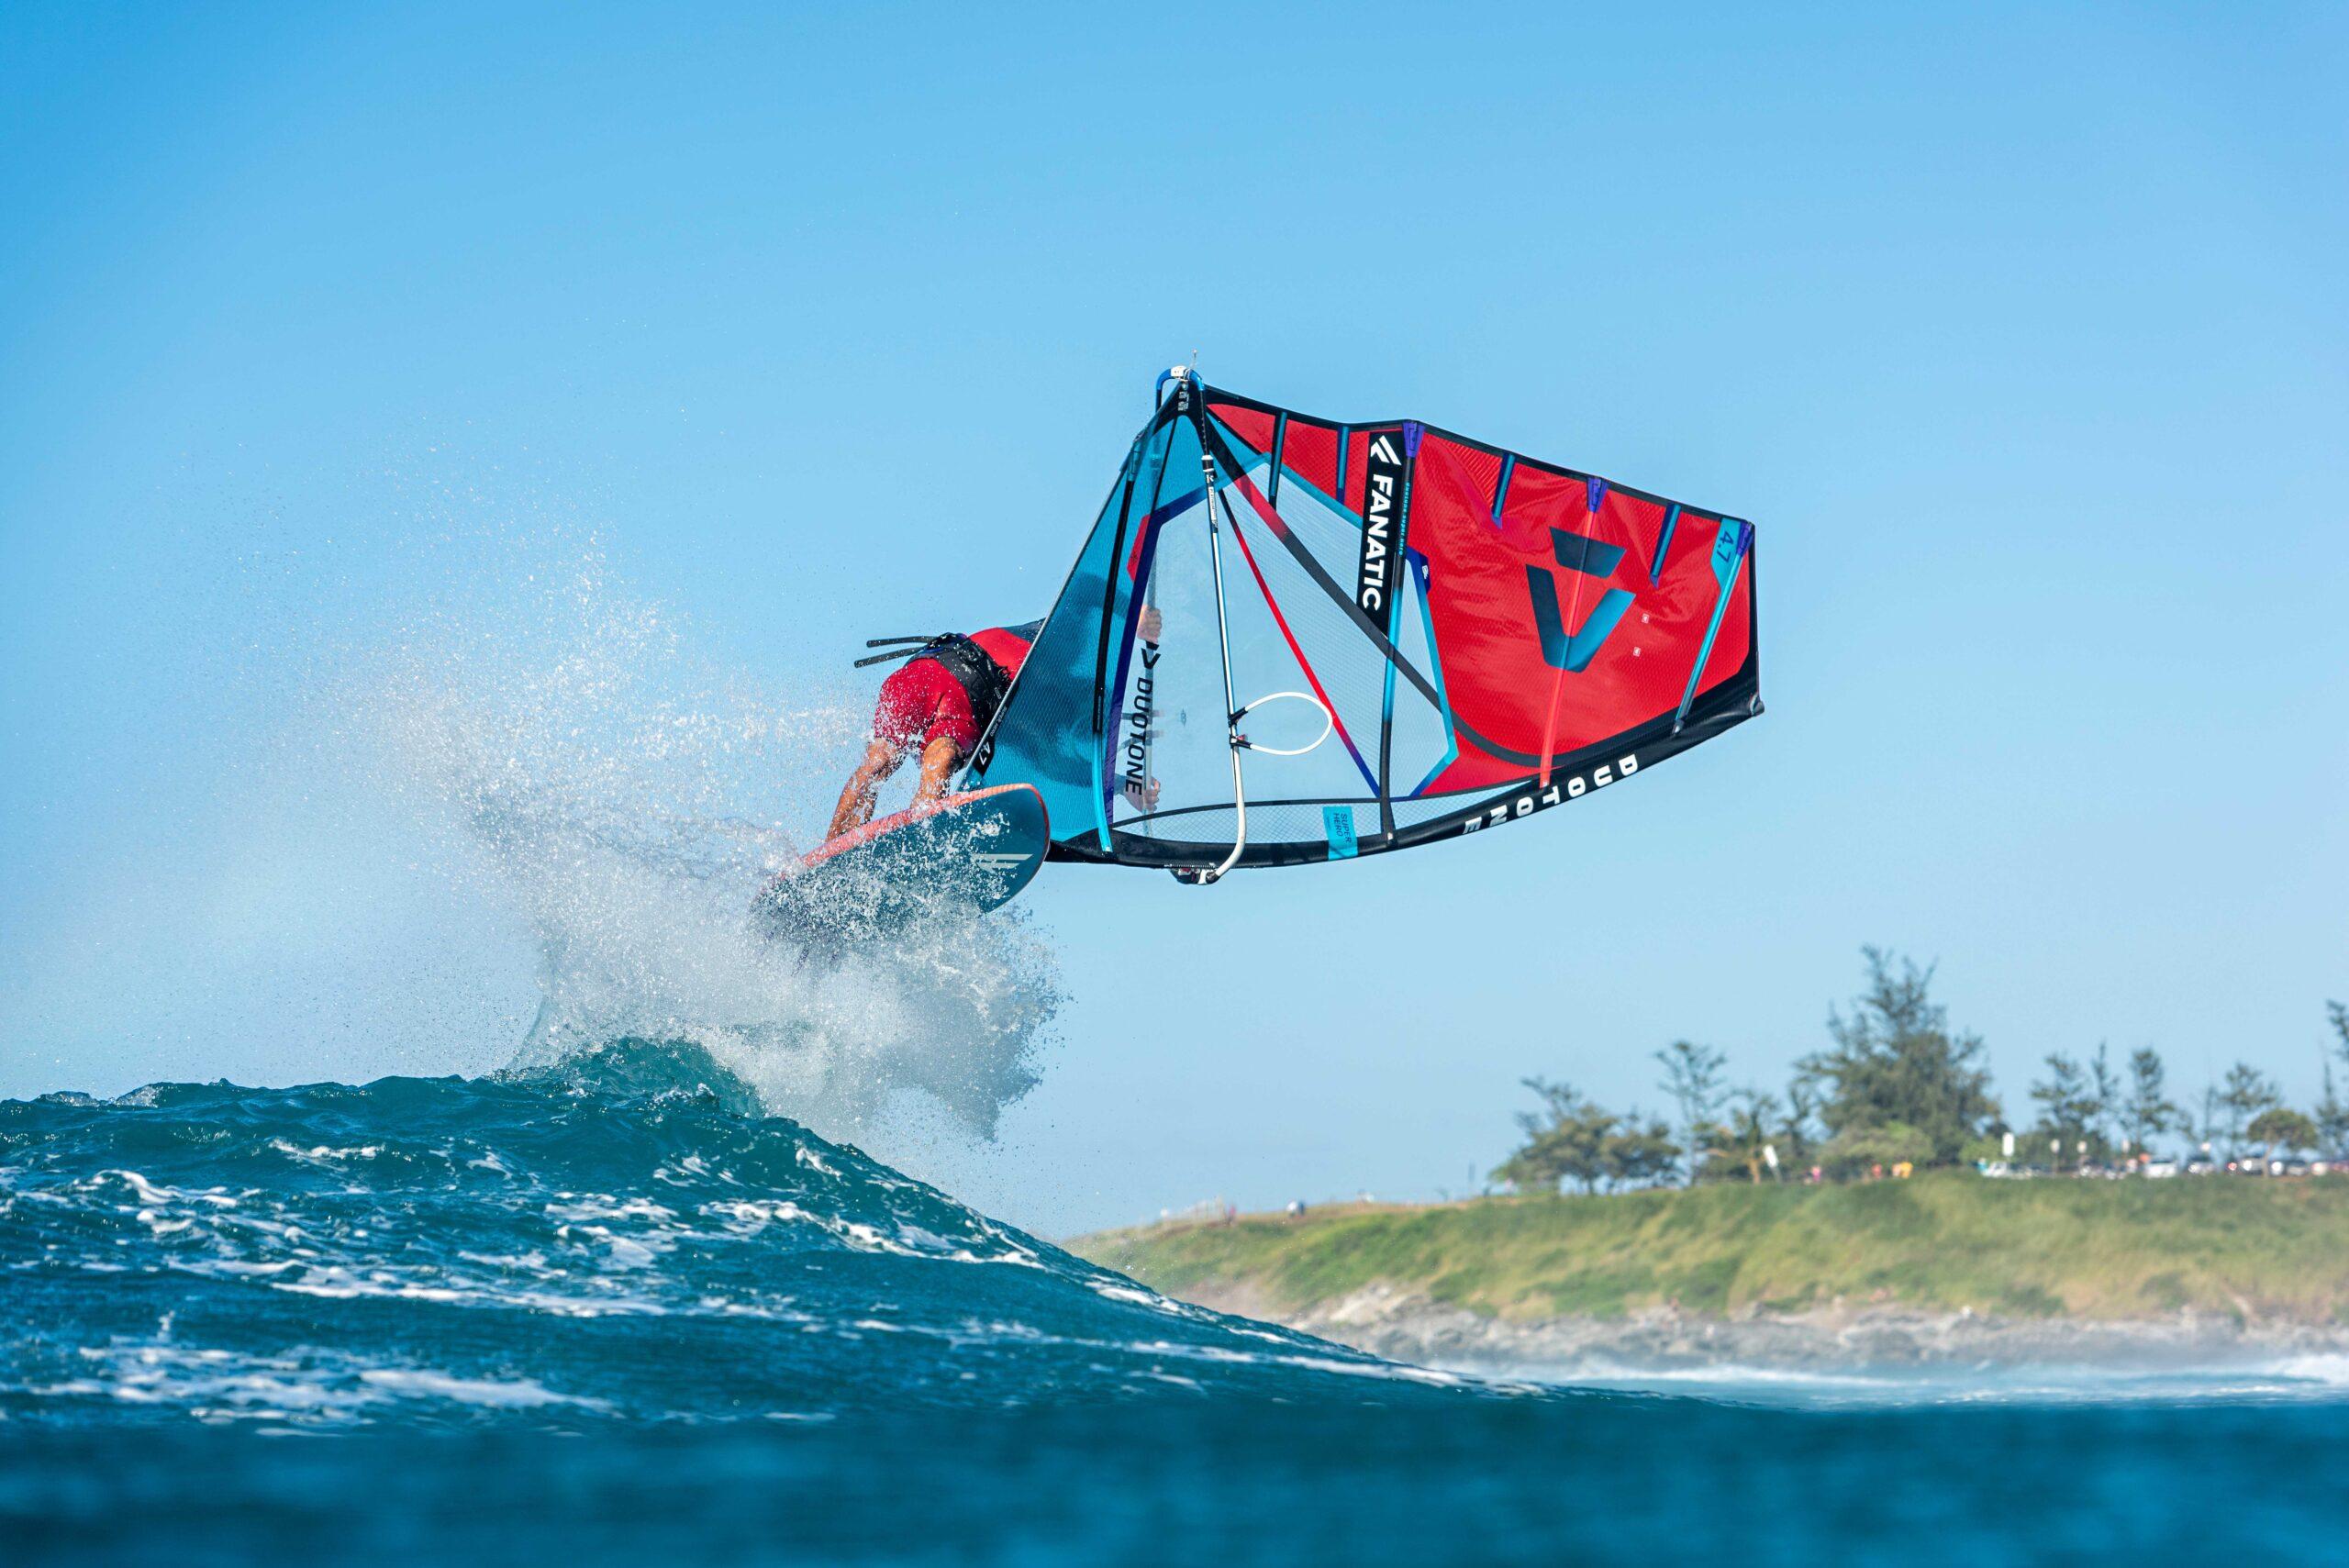 Brandneu zum Surf-Festival: Das Duotone SUPER_HERO 2022